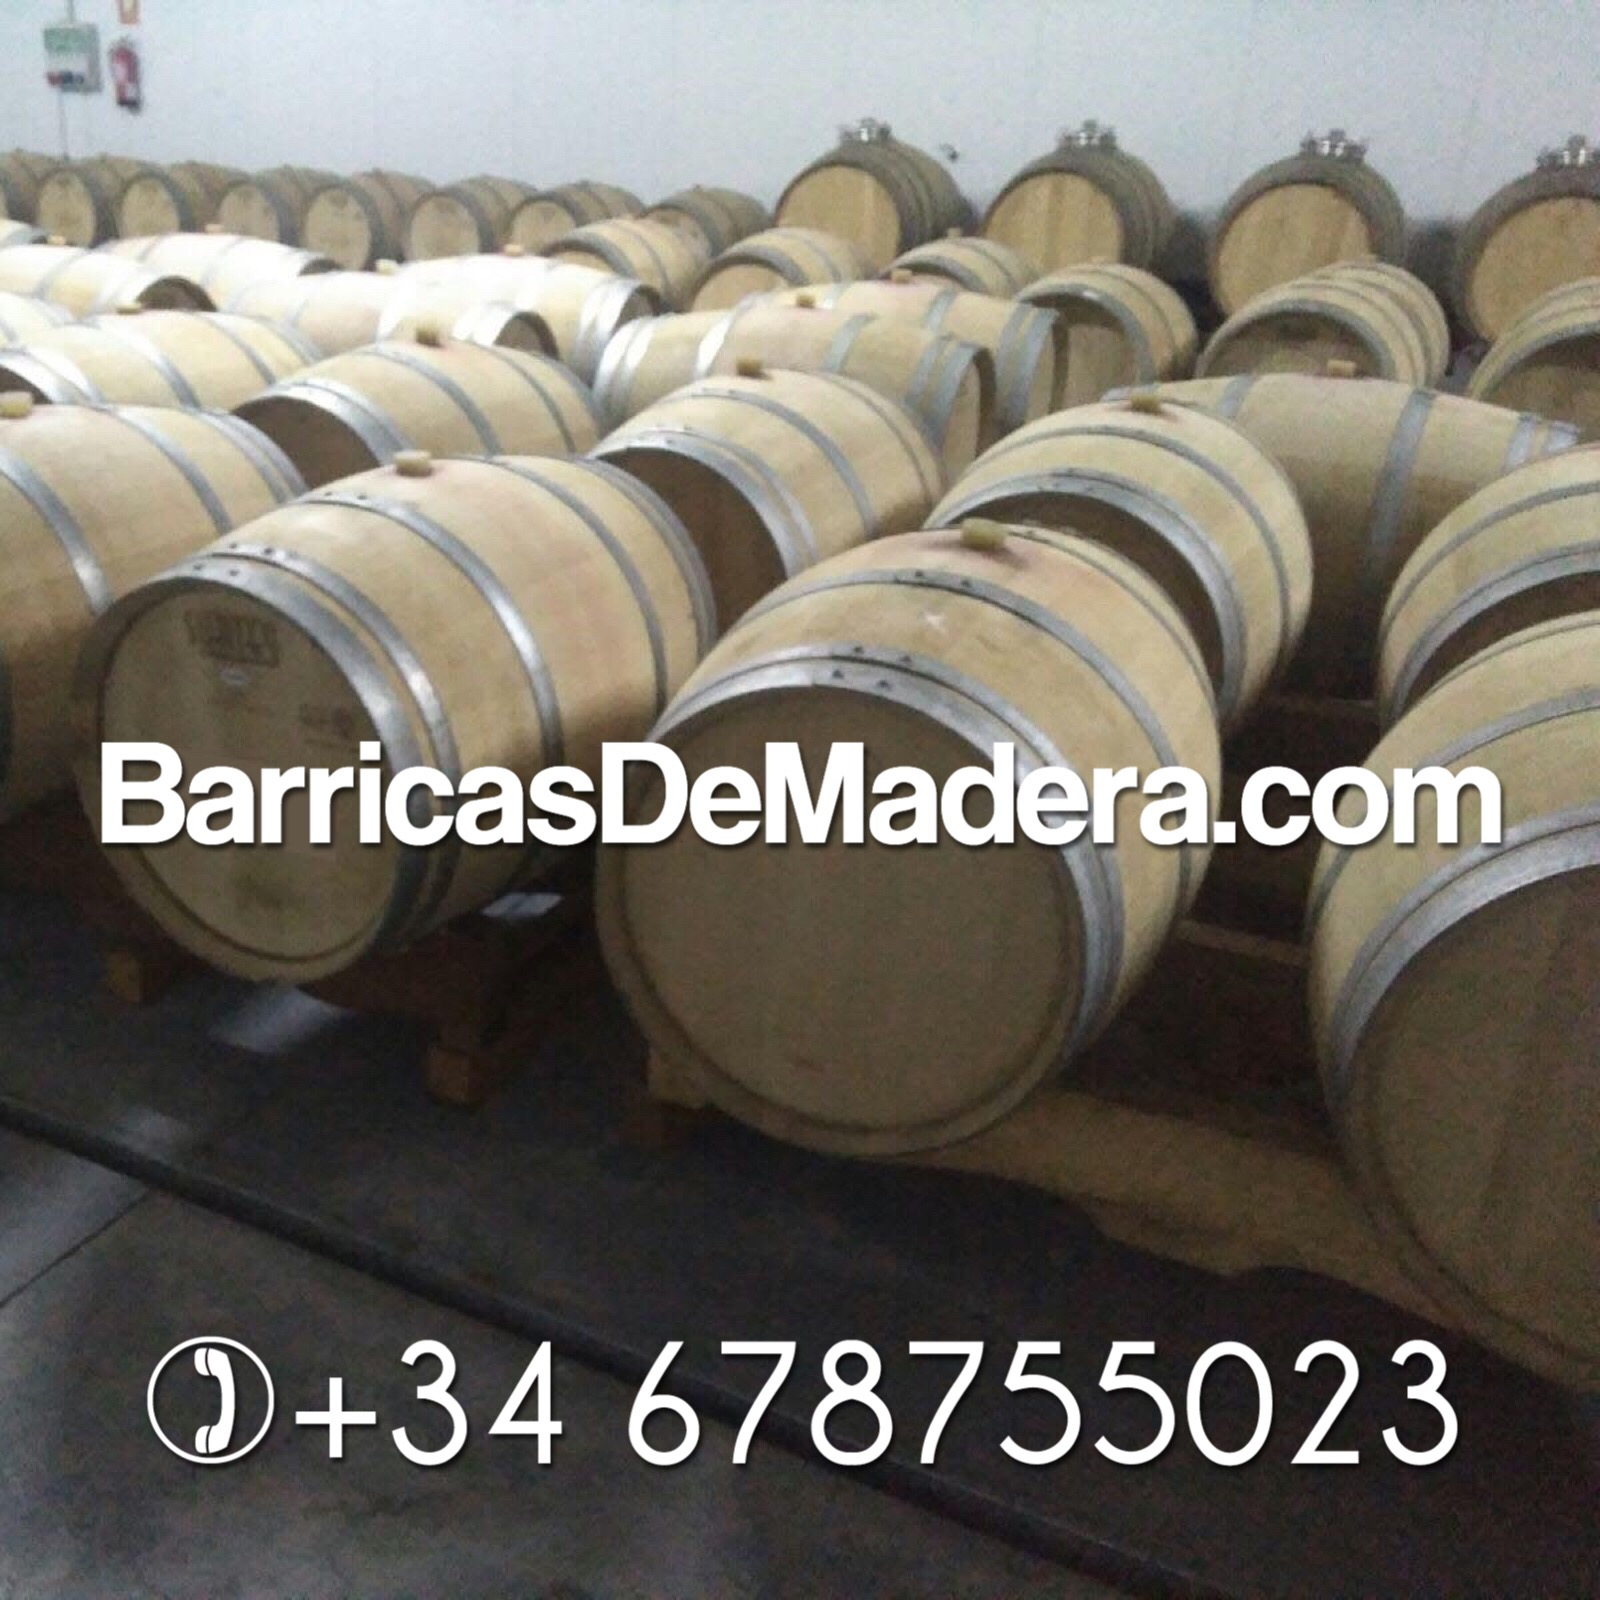 used-wine.barrels-winery-cellar-spain